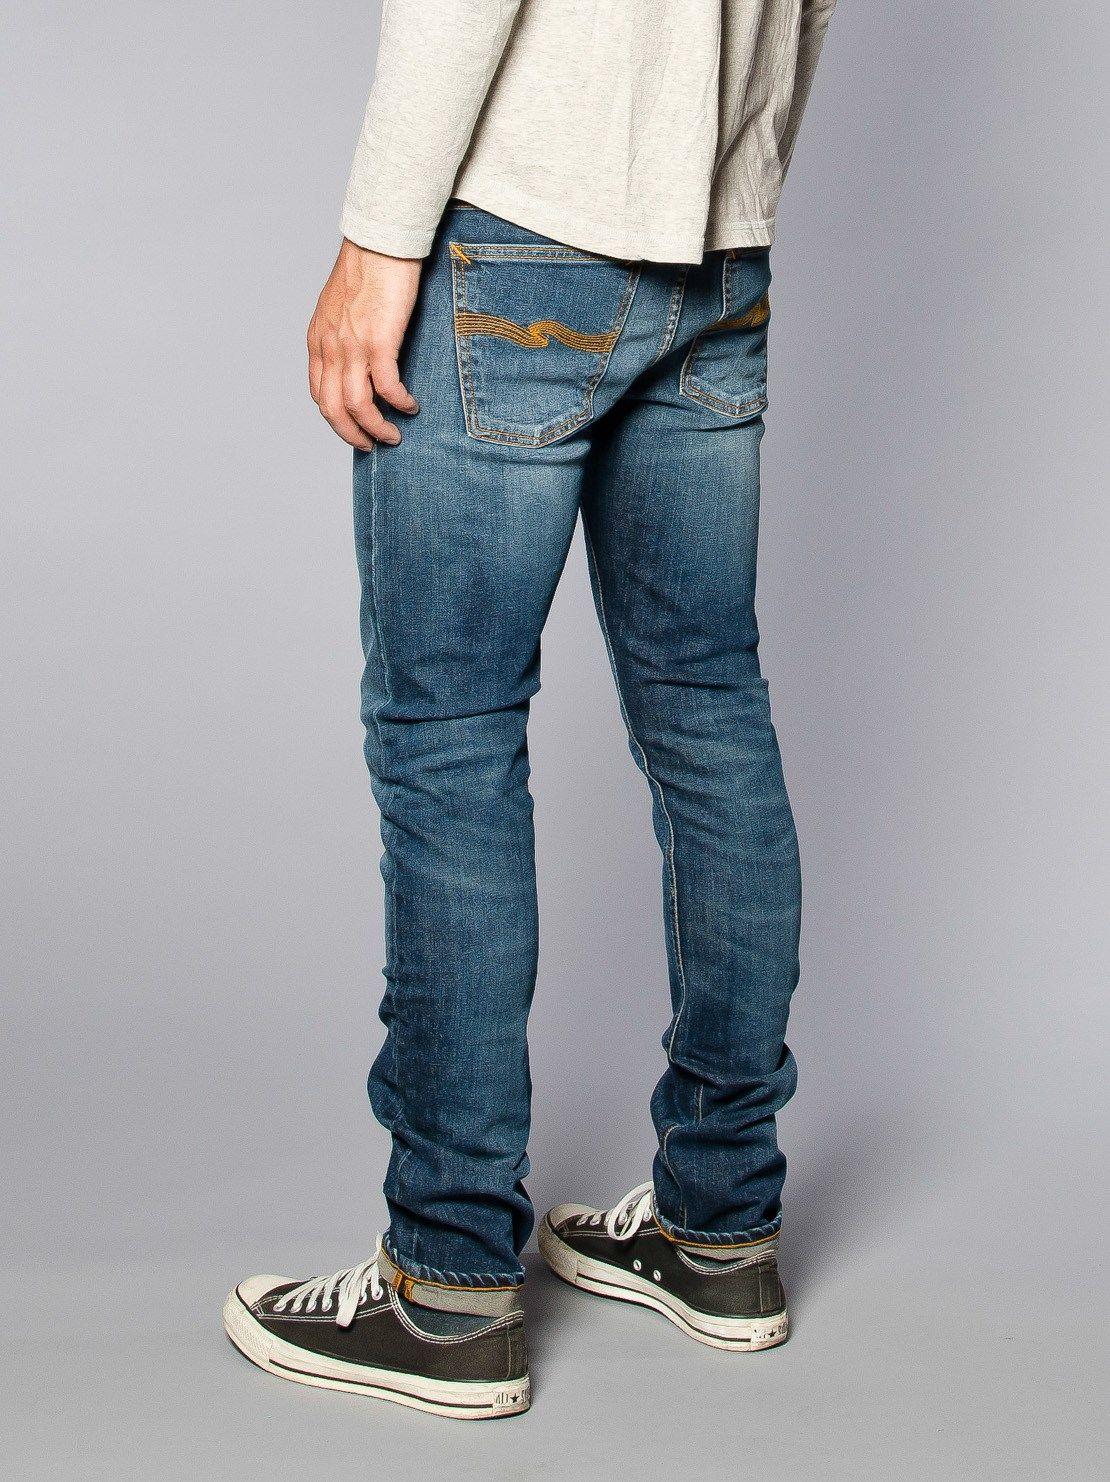 Tube Tom Blue Nights - Nudie Jeans Co Online Shop  70d752659